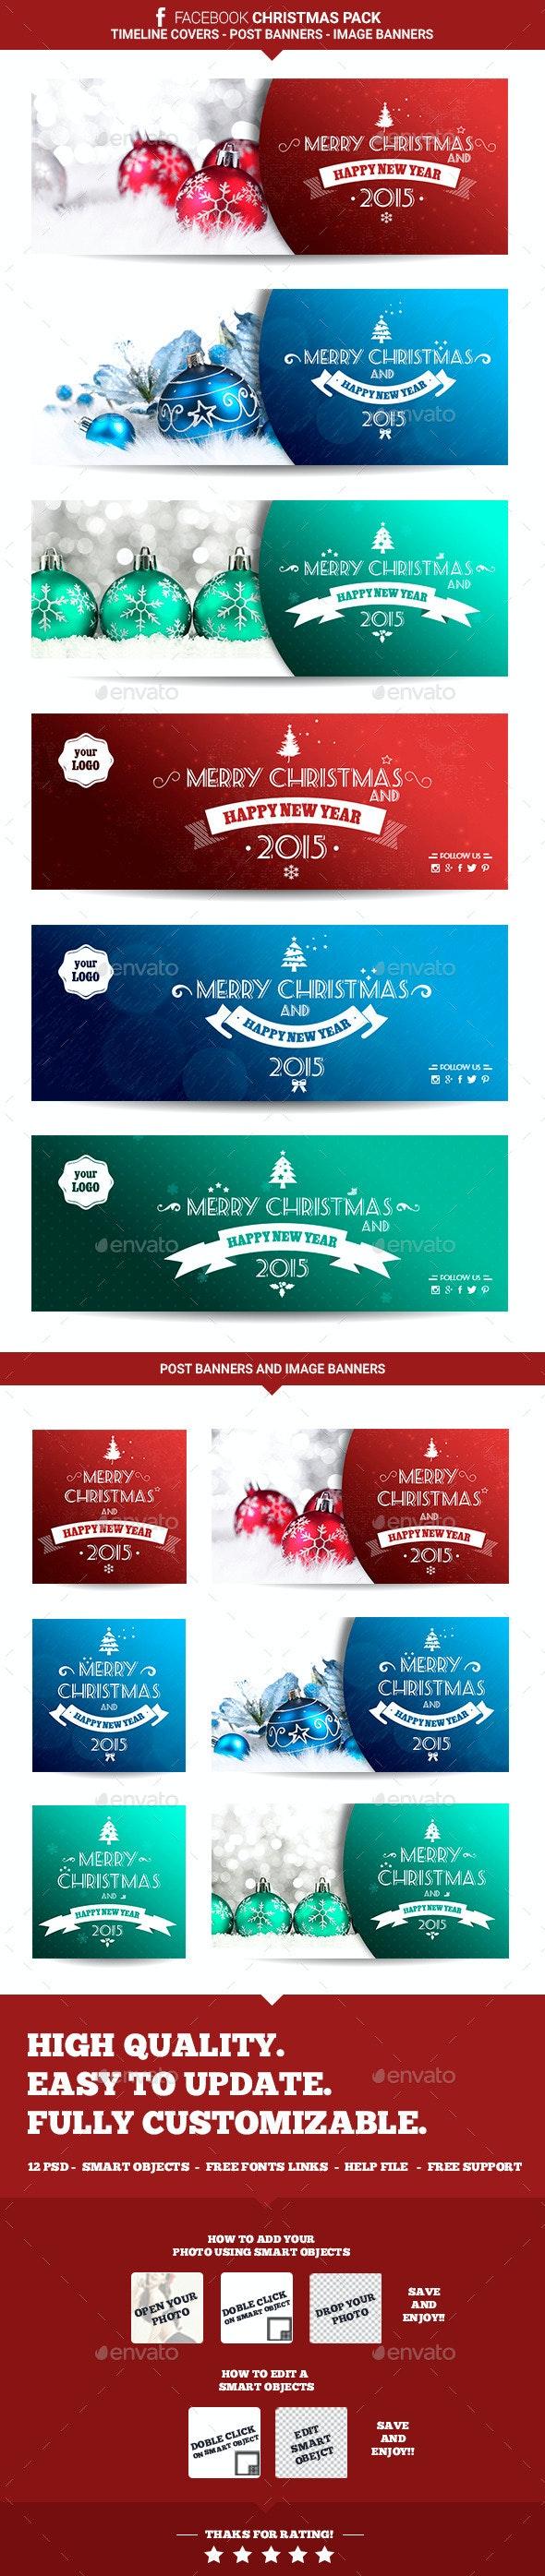 Facebook Christmas Pack - Facebook Timeline Covers Social Media